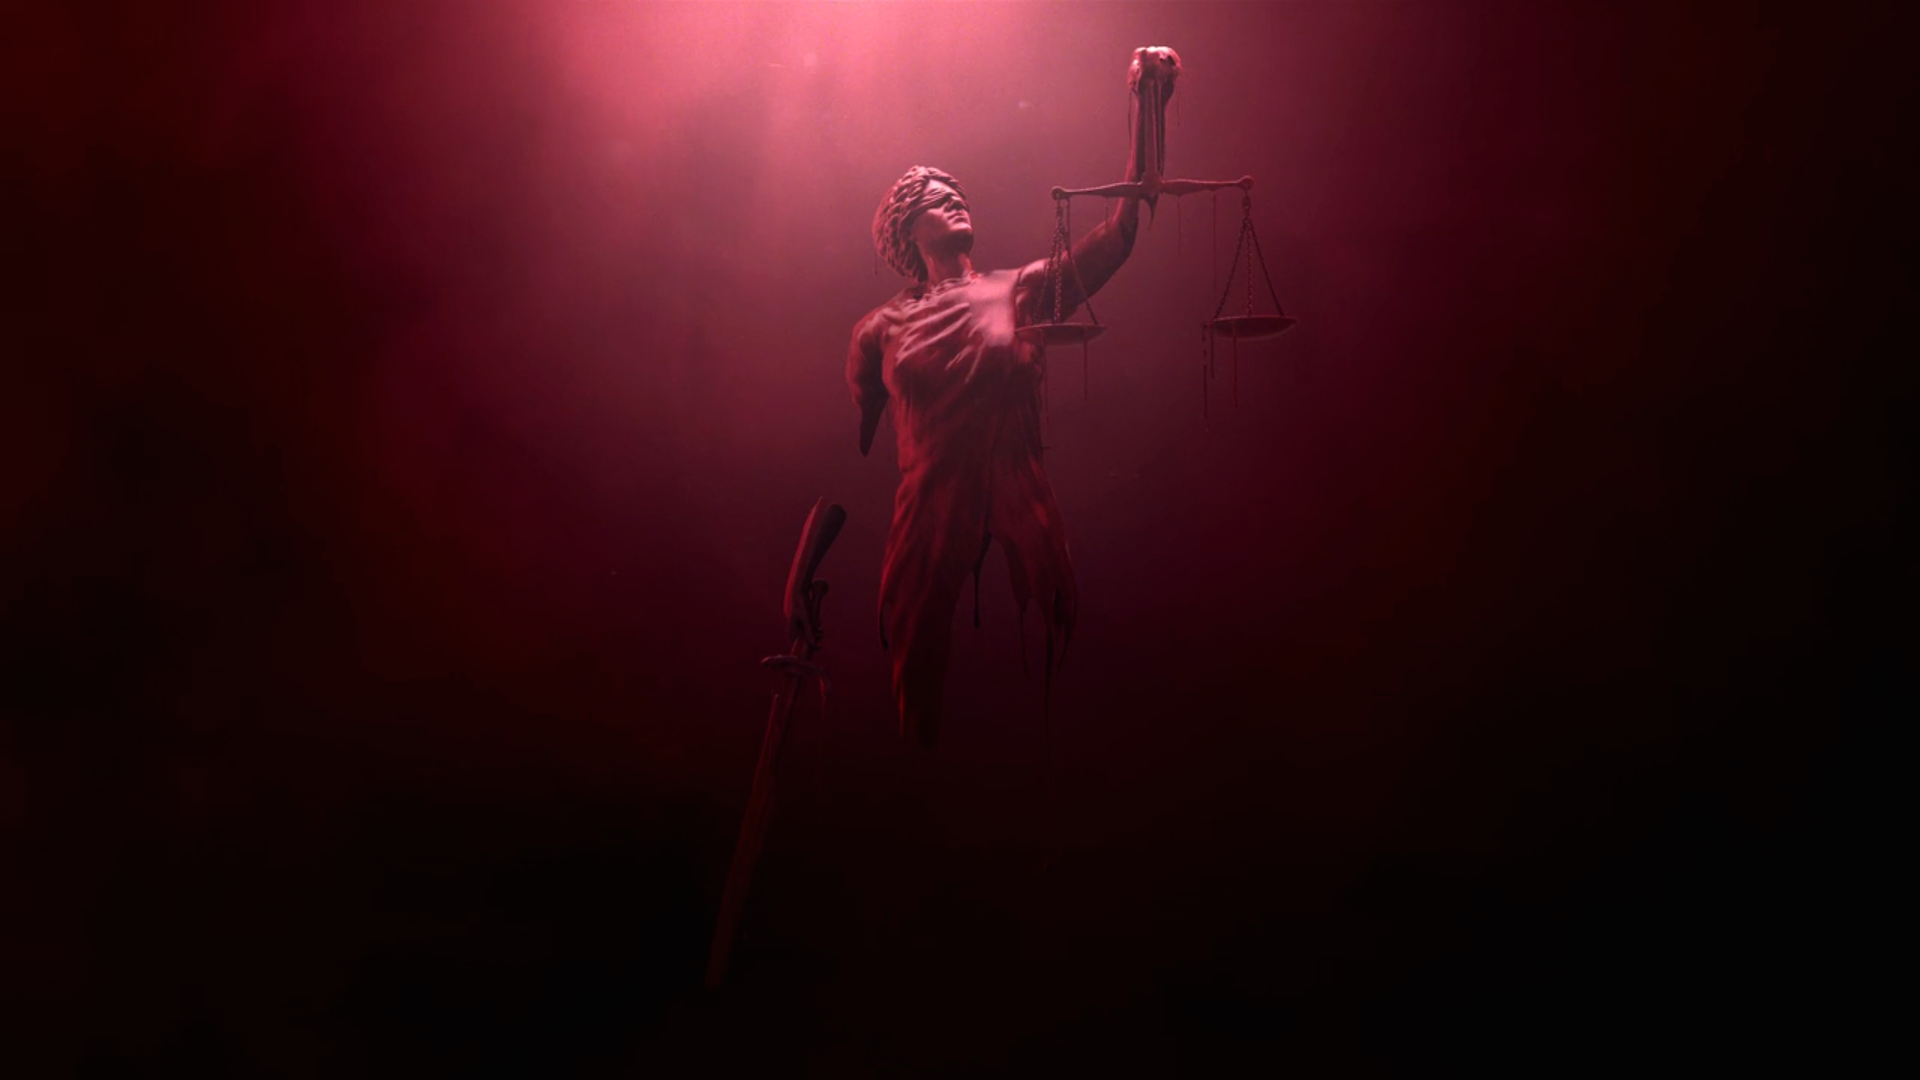 Daredevil (2015) Wallpaper Thread : Defenders